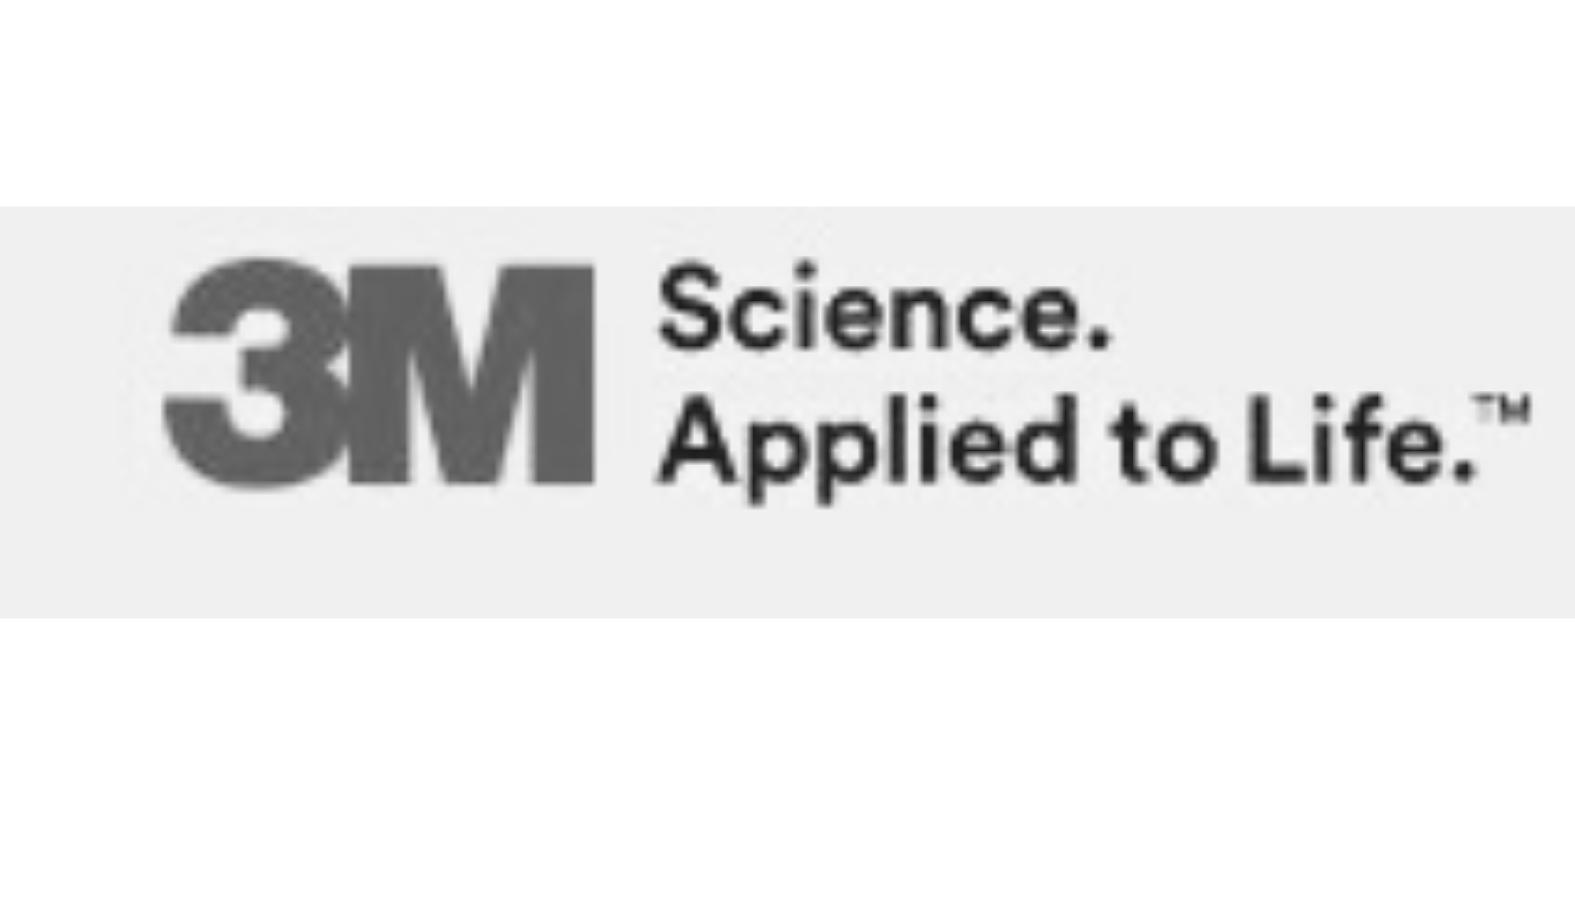 3M Science.